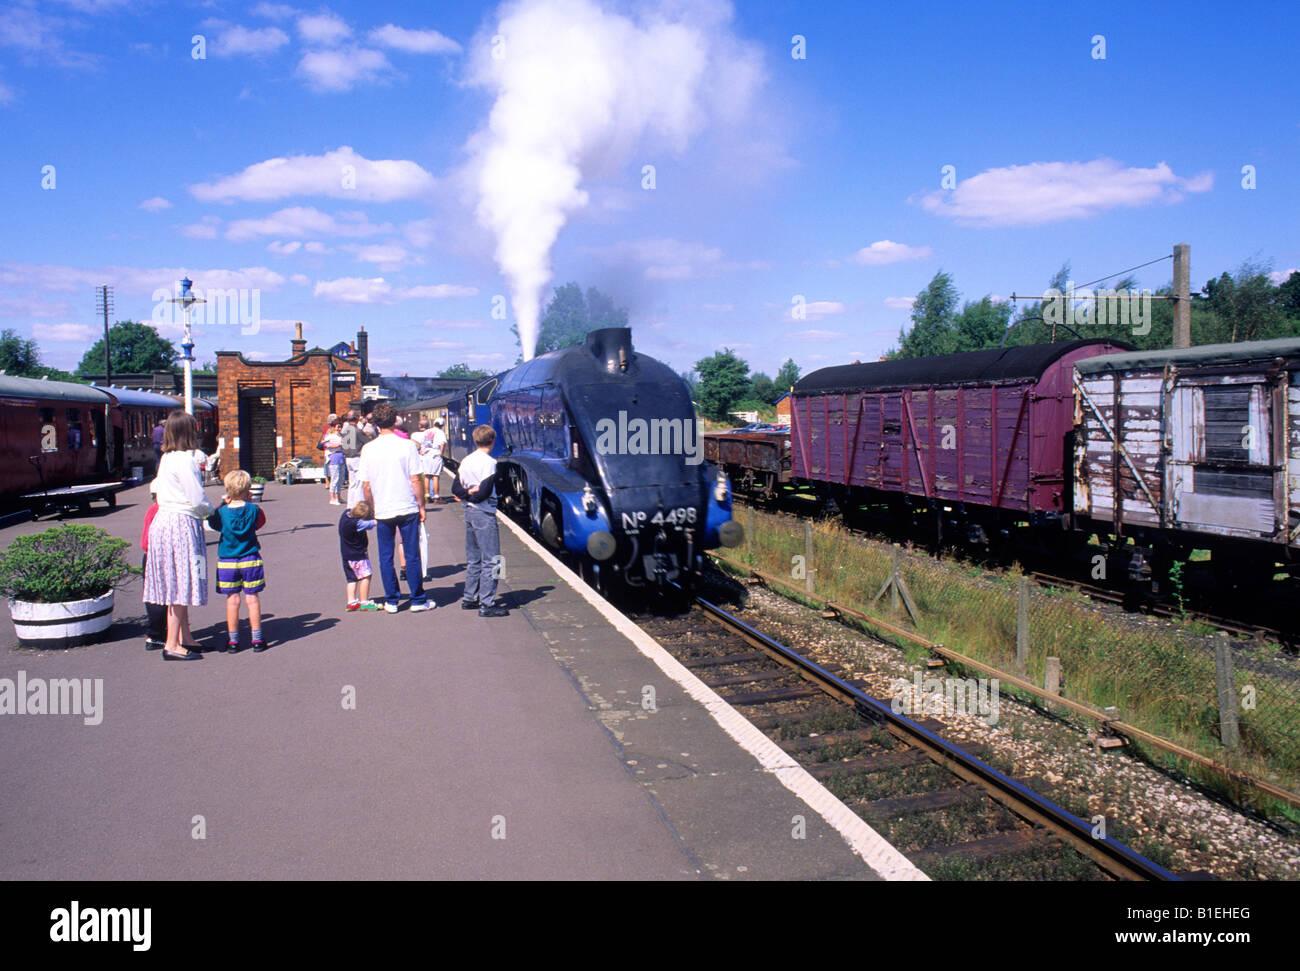 Rothley Leicestershire Sir Nigel Gressley people steam train engine platform blue streamline transport vintage England - Stock Image